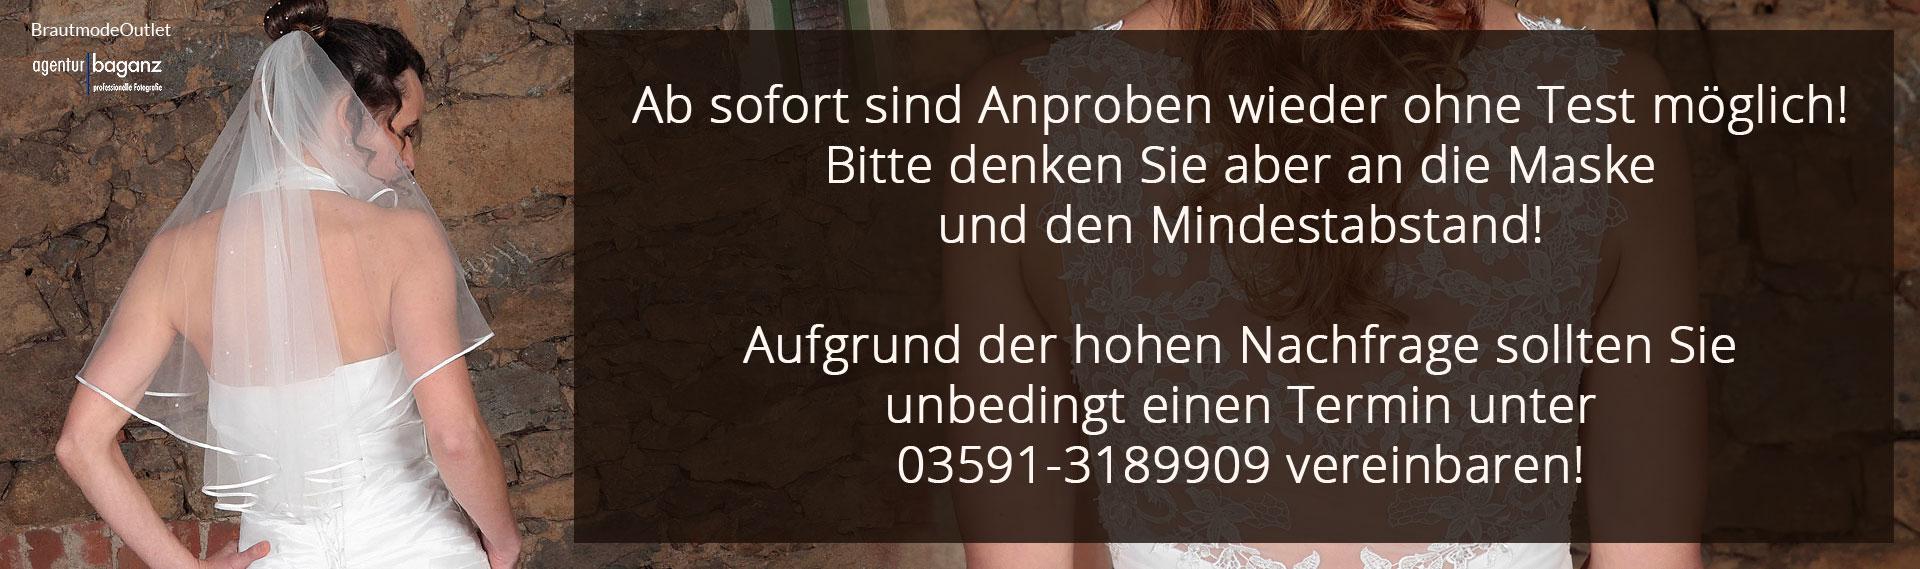 Brautmode Outlet Bautzen Anprobe Termin